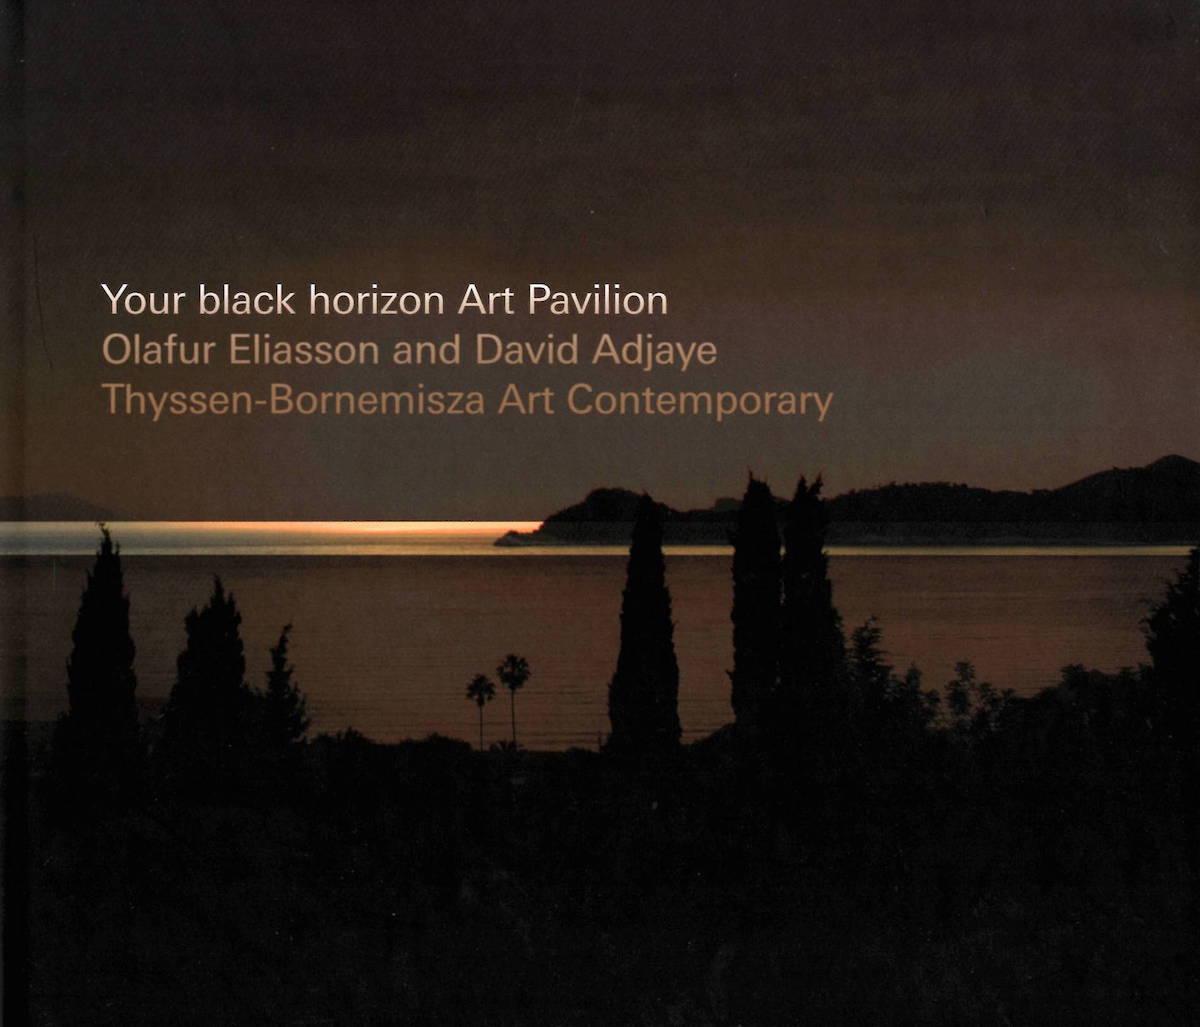 Your black horizon art pavilion